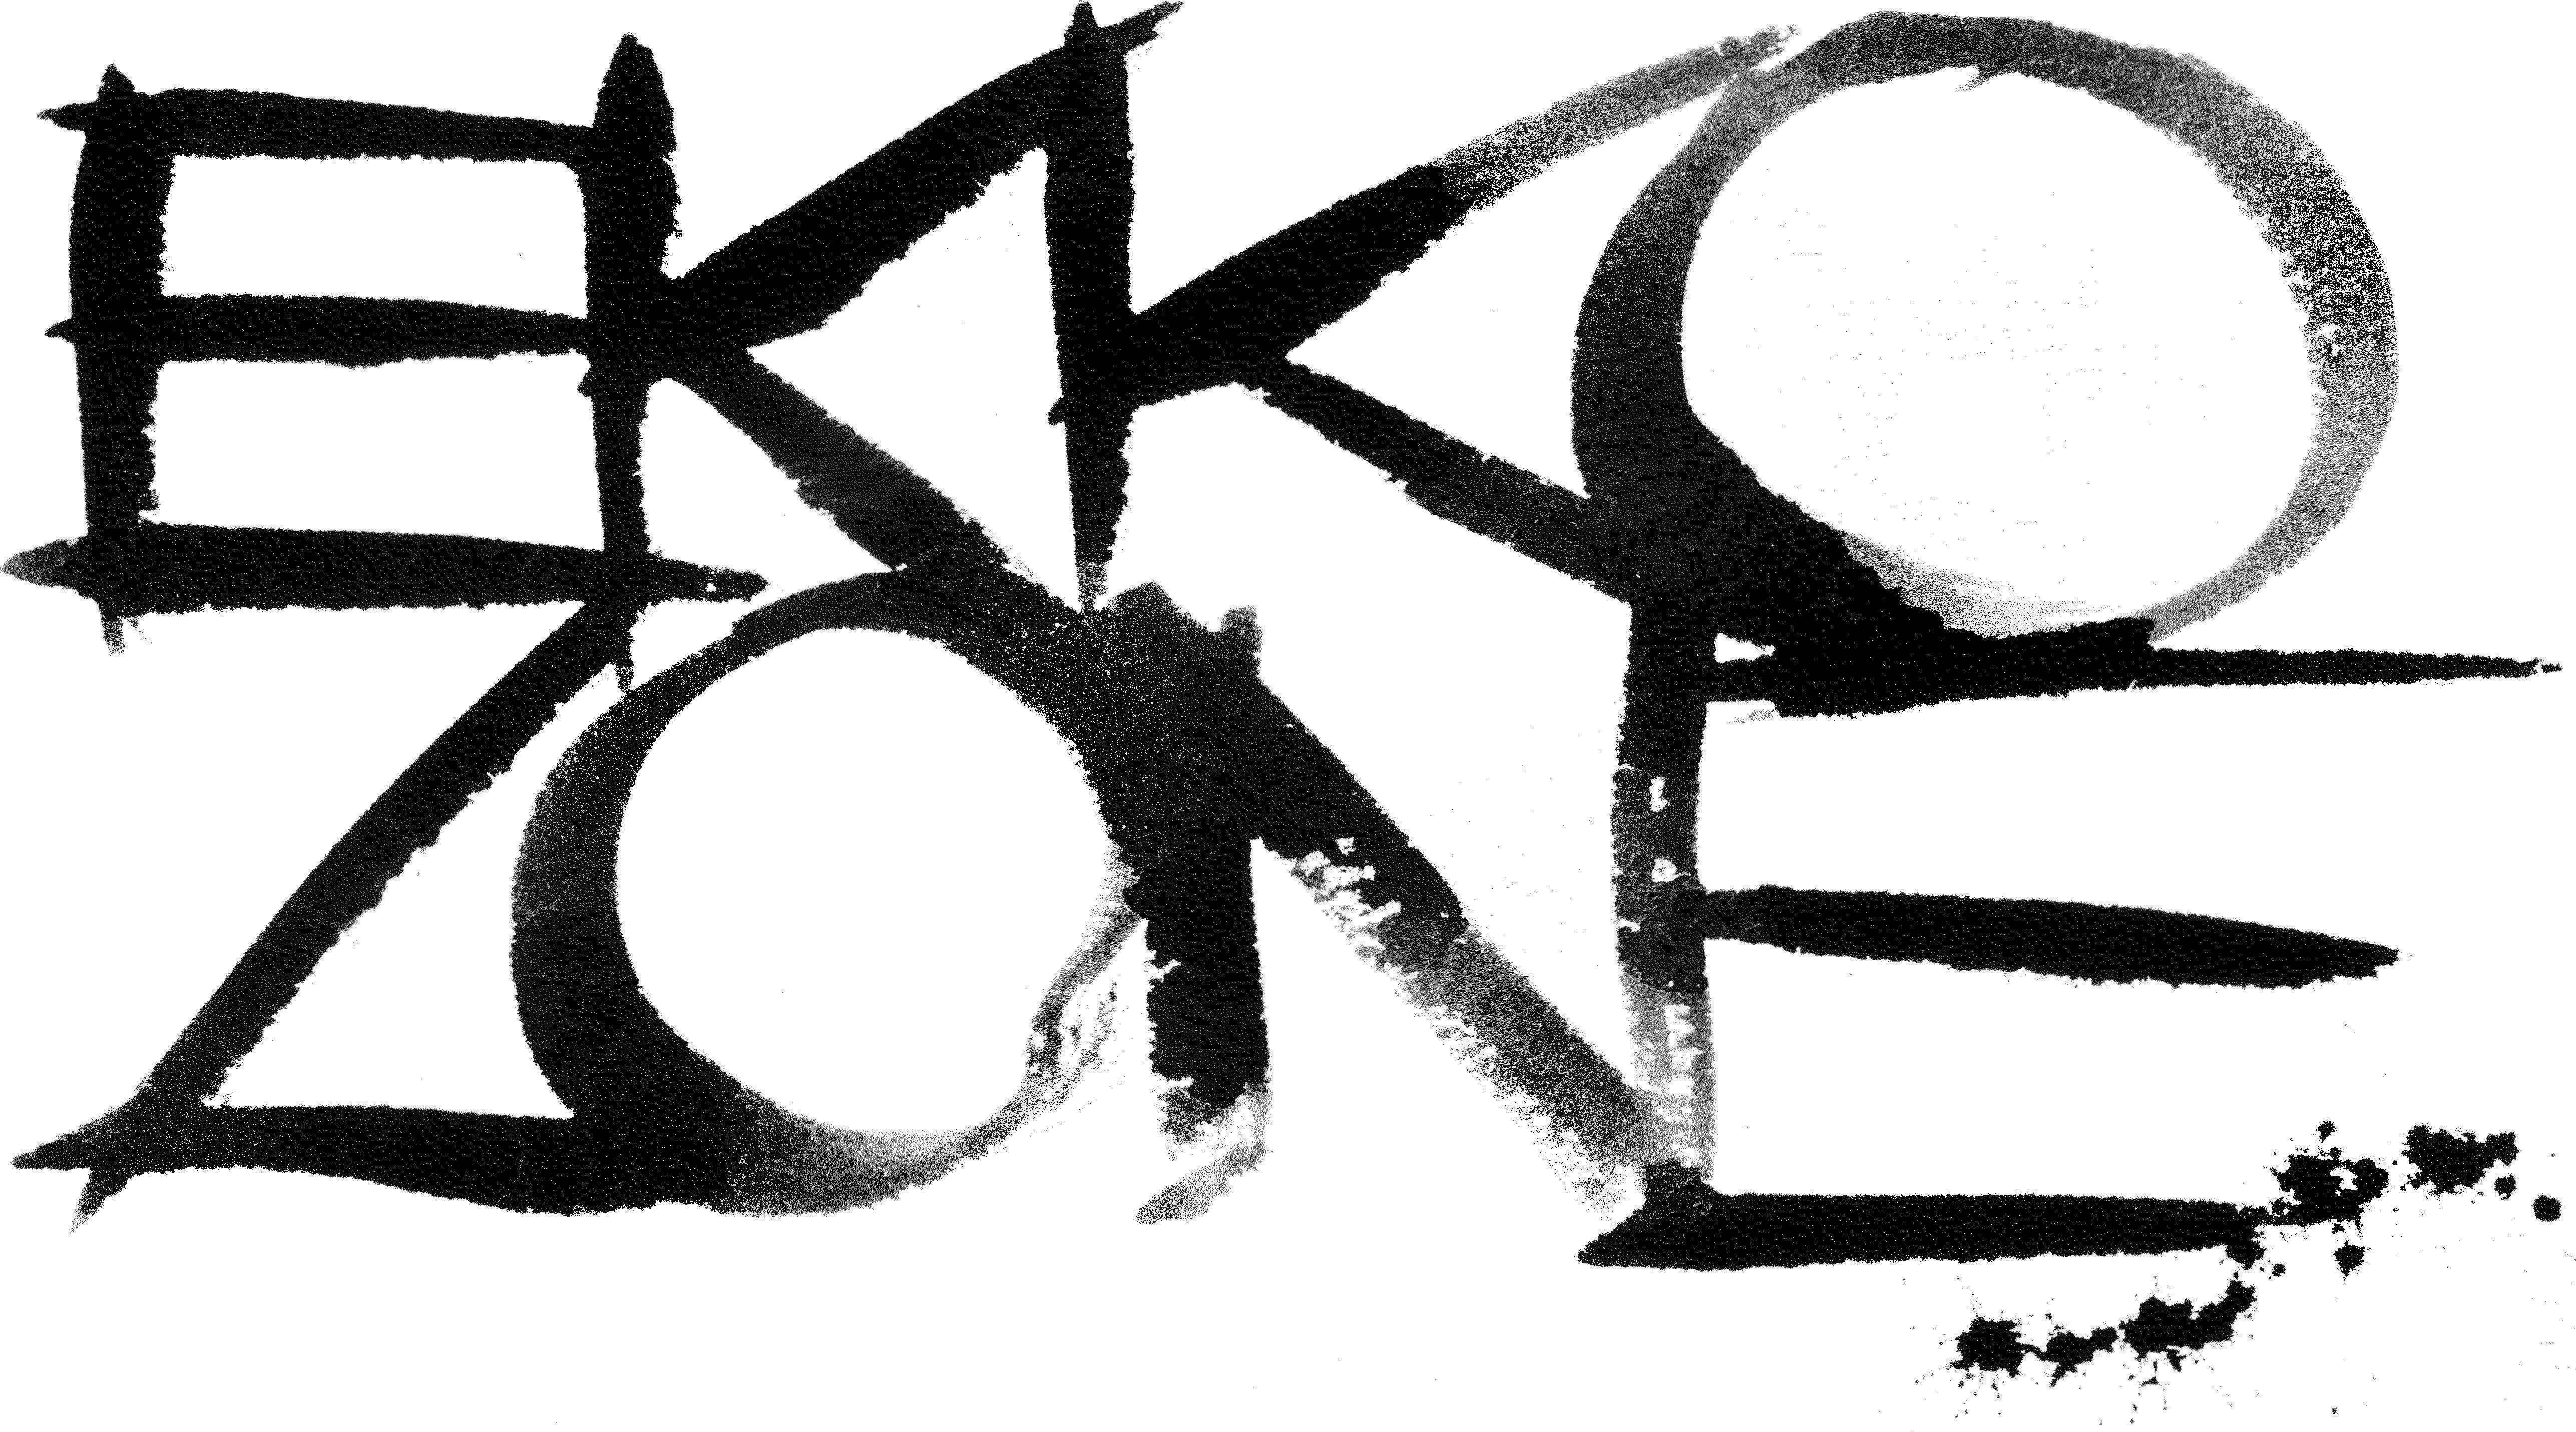 Ekkozone.dk